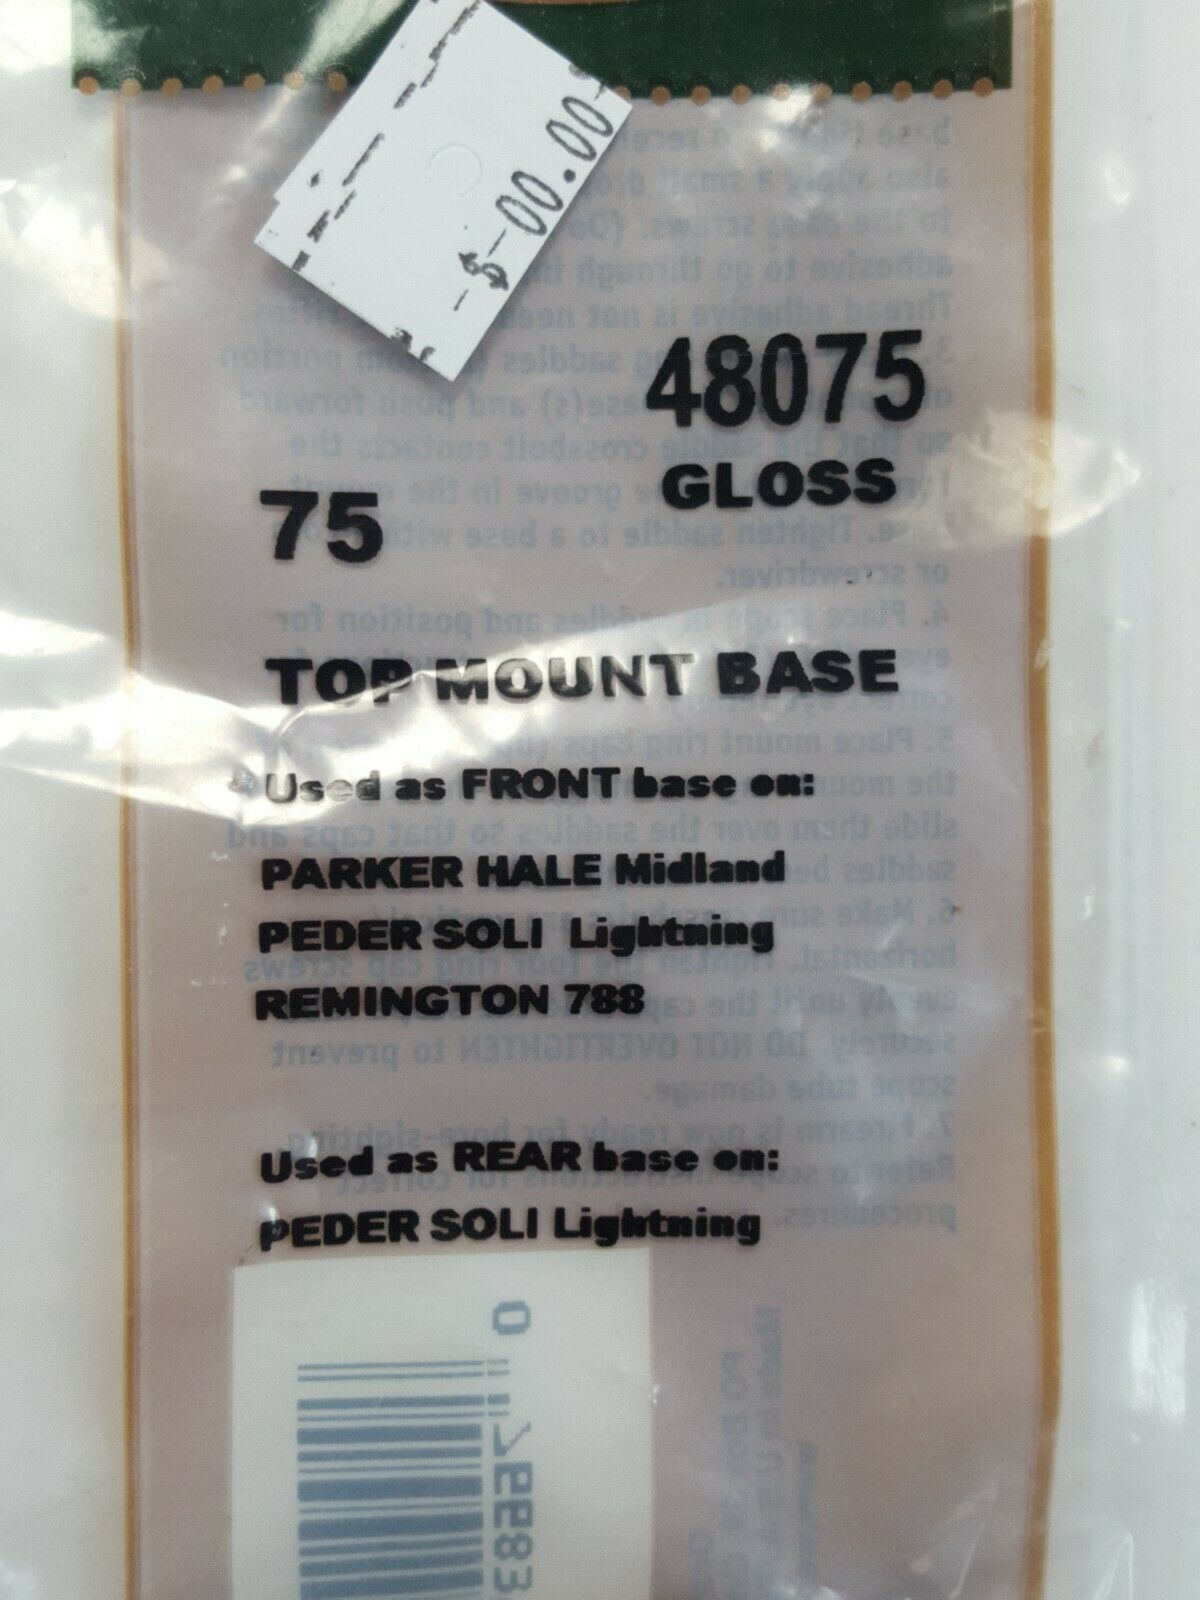 Weaver Top Mount Base 75 Parker-Hale Midland Remington 788 48075